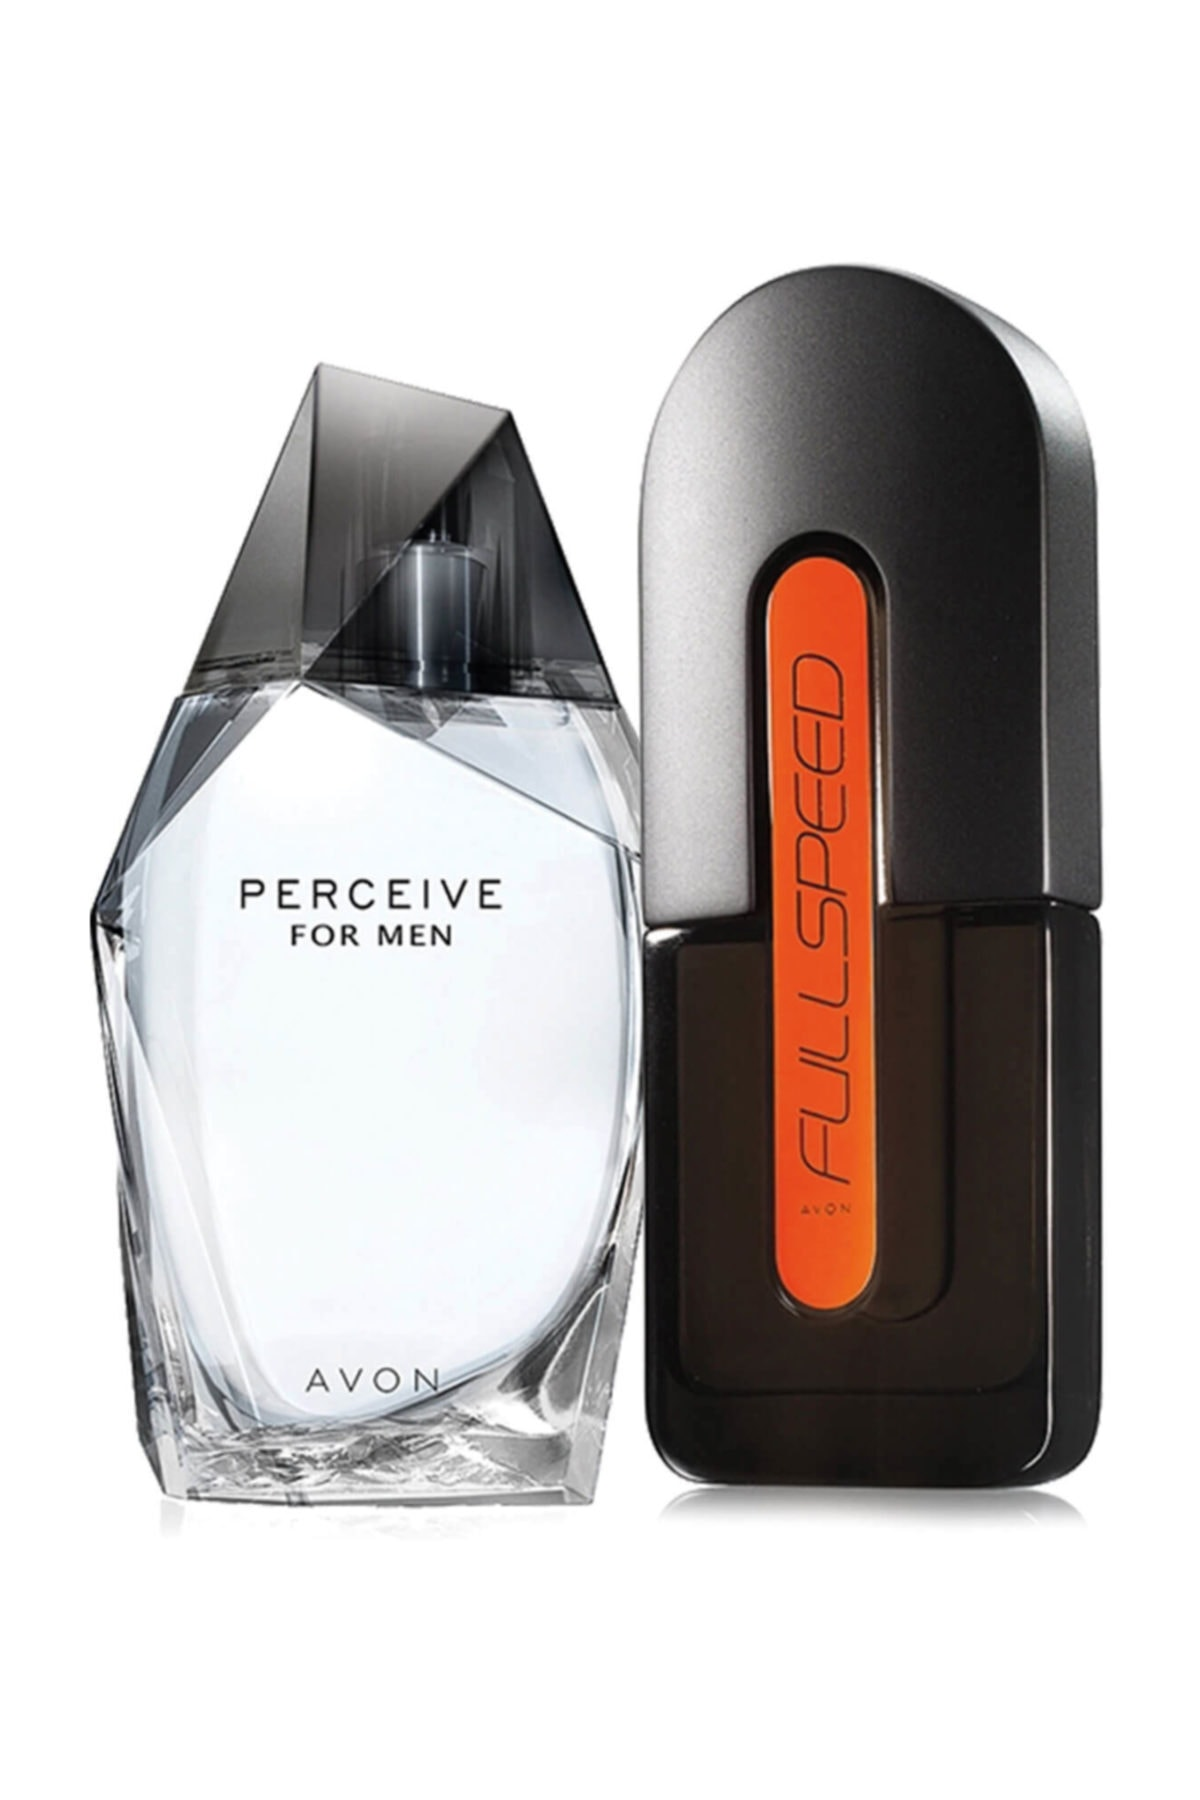 AVON Perceive Ve Full Speed Ikili Set Erkek Parfümü 5050000000192 1